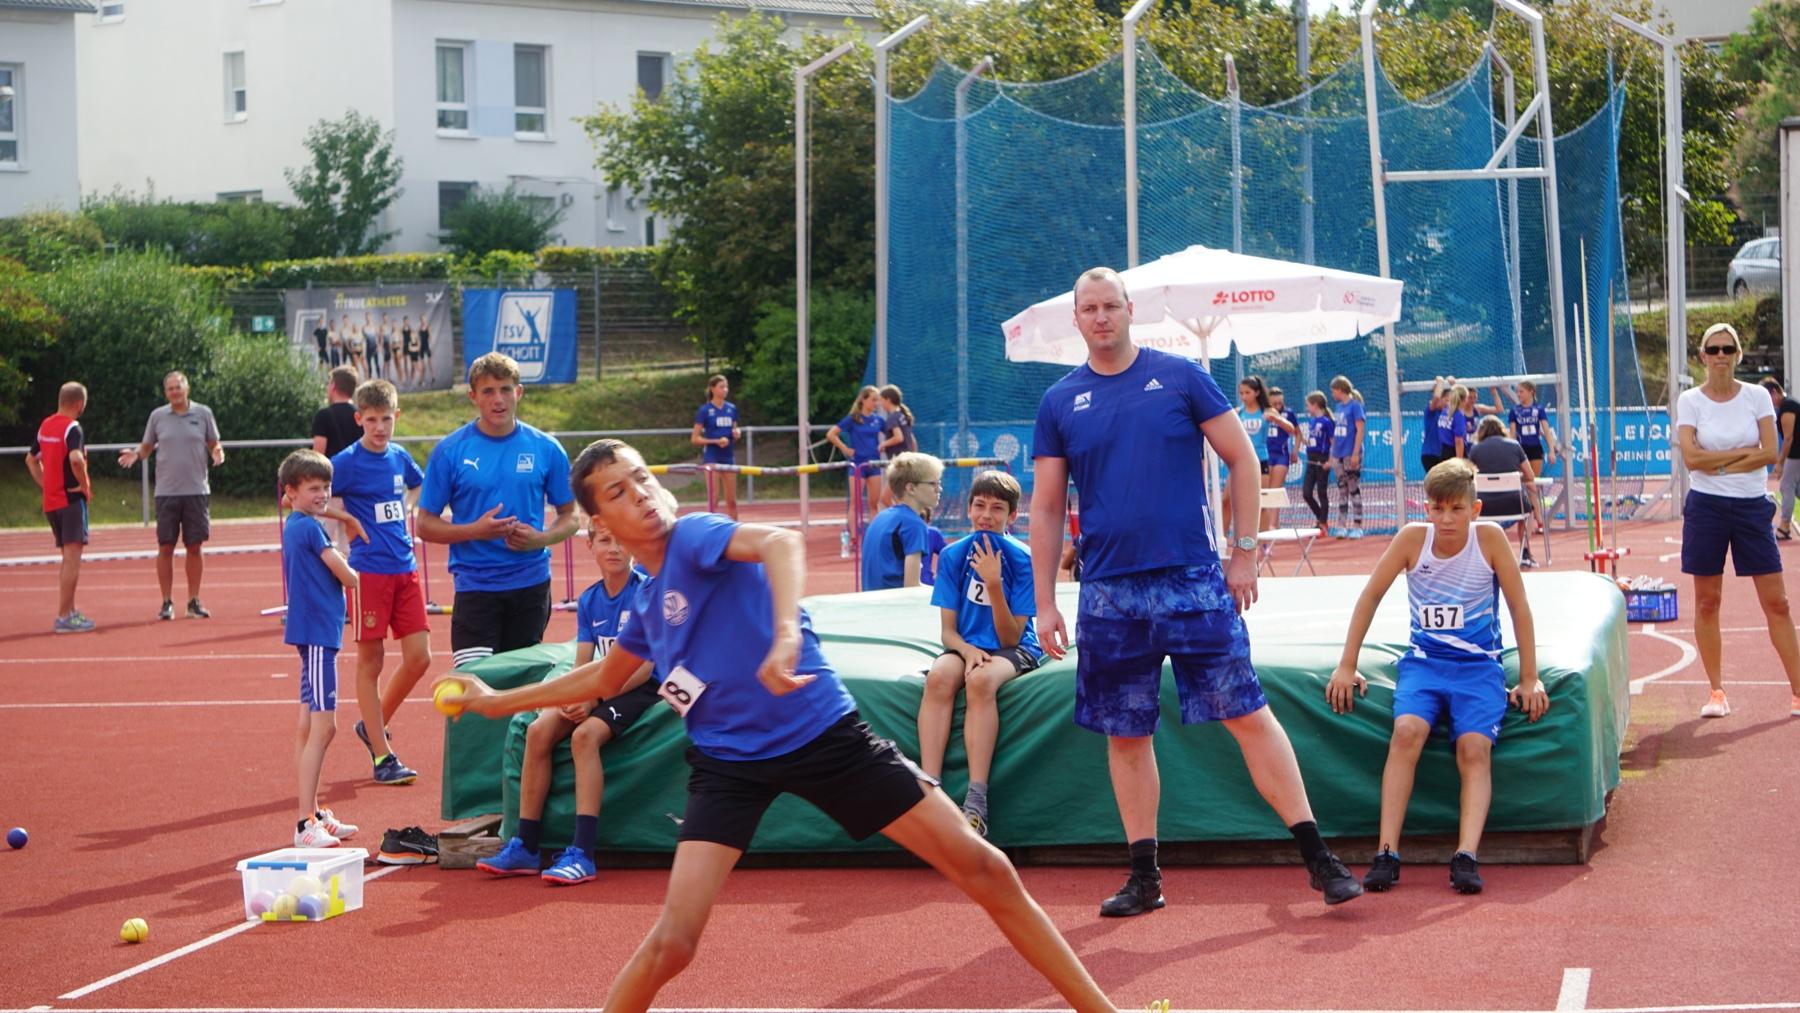 Schott-2020-08-15-basti-wurf-DSC06742